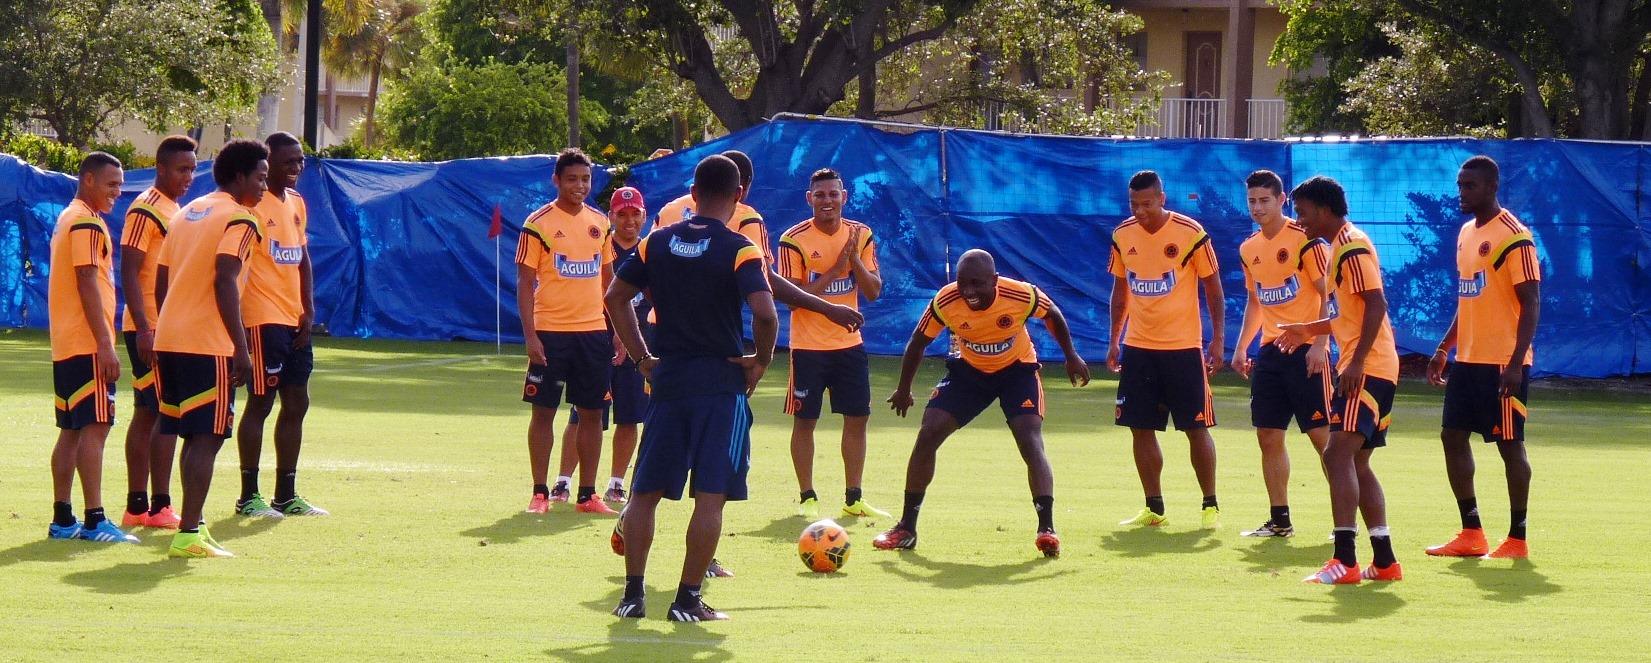 La Selección Colombia continúa preparándose para enfrentar a Brasil